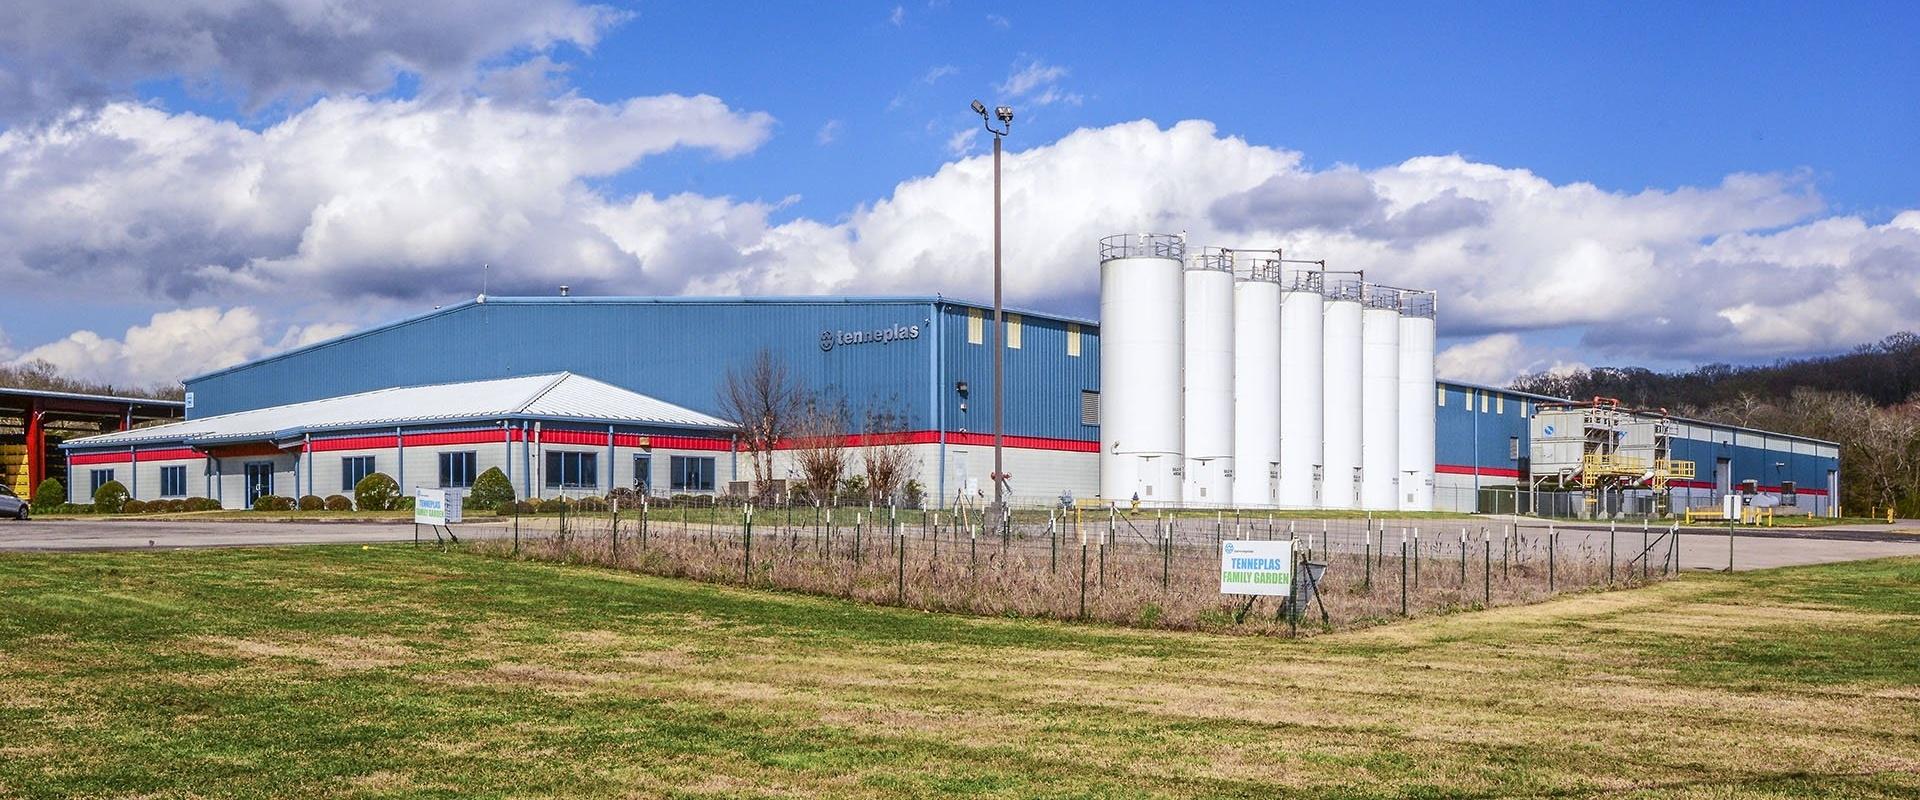 Tenneplas - Windsor Mold USA